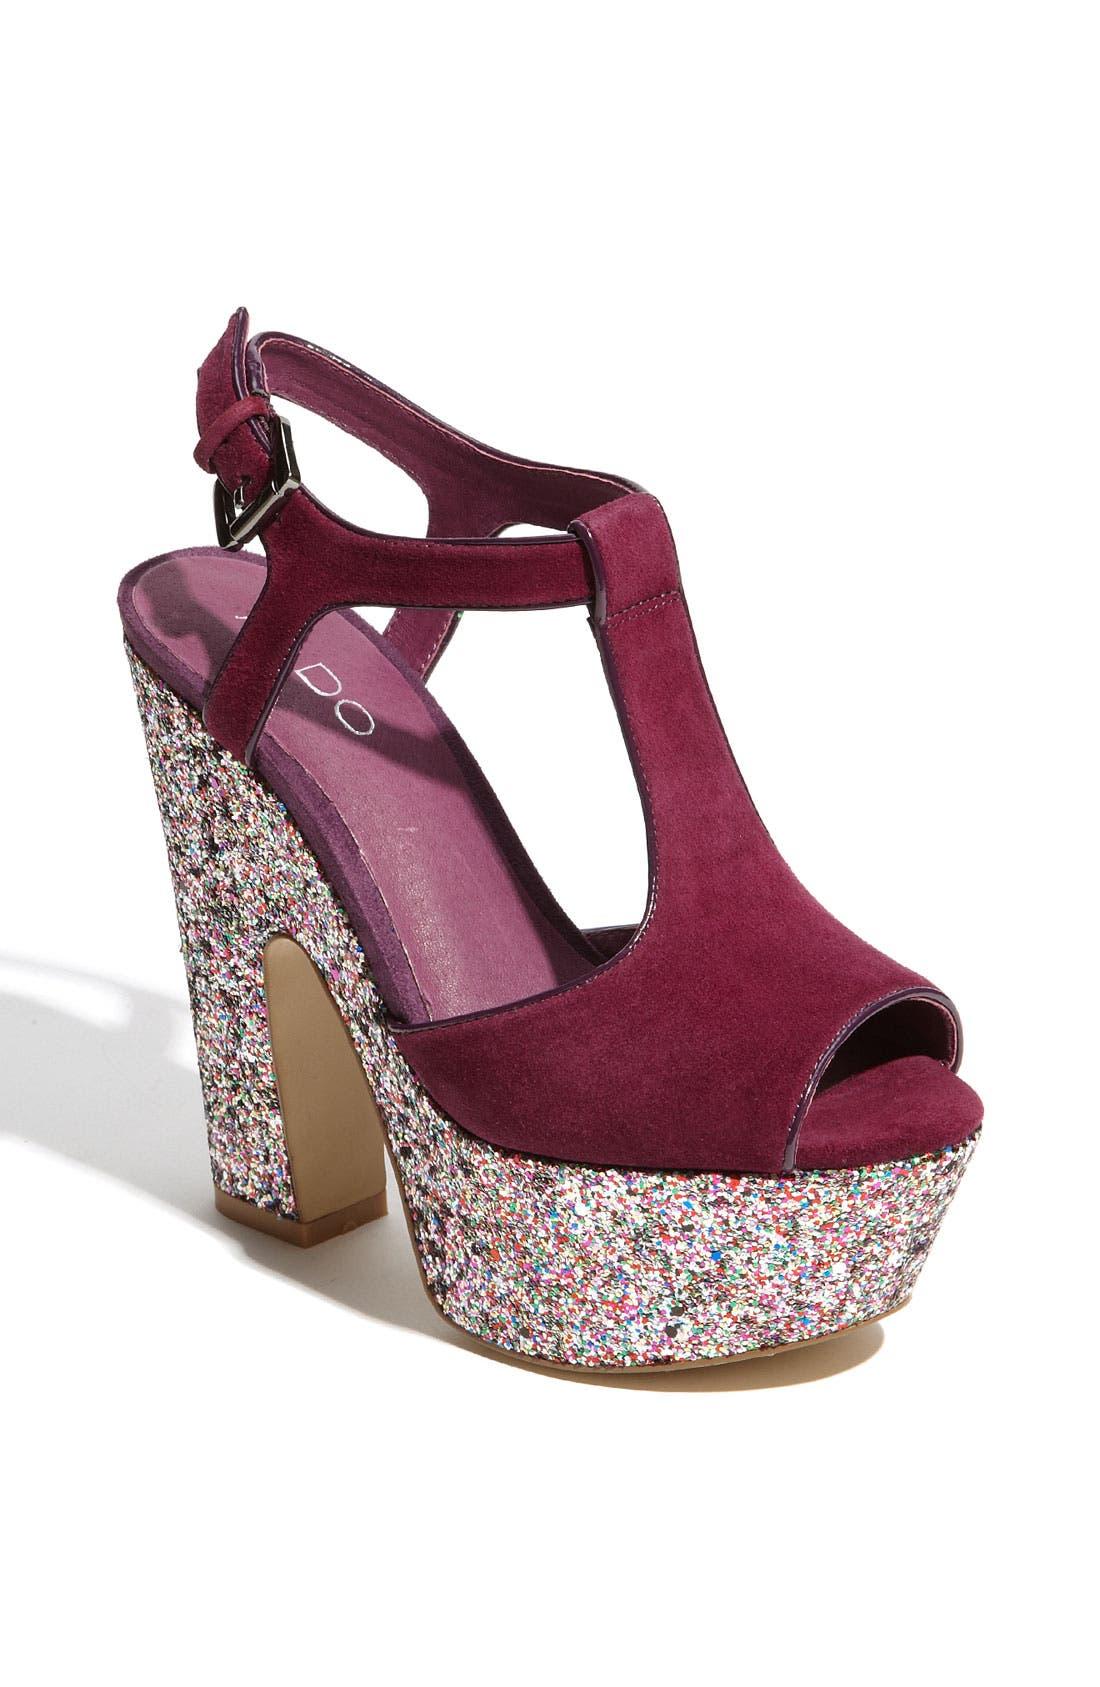 Main Image - ALDO 'Trejos Glitter' Sandal